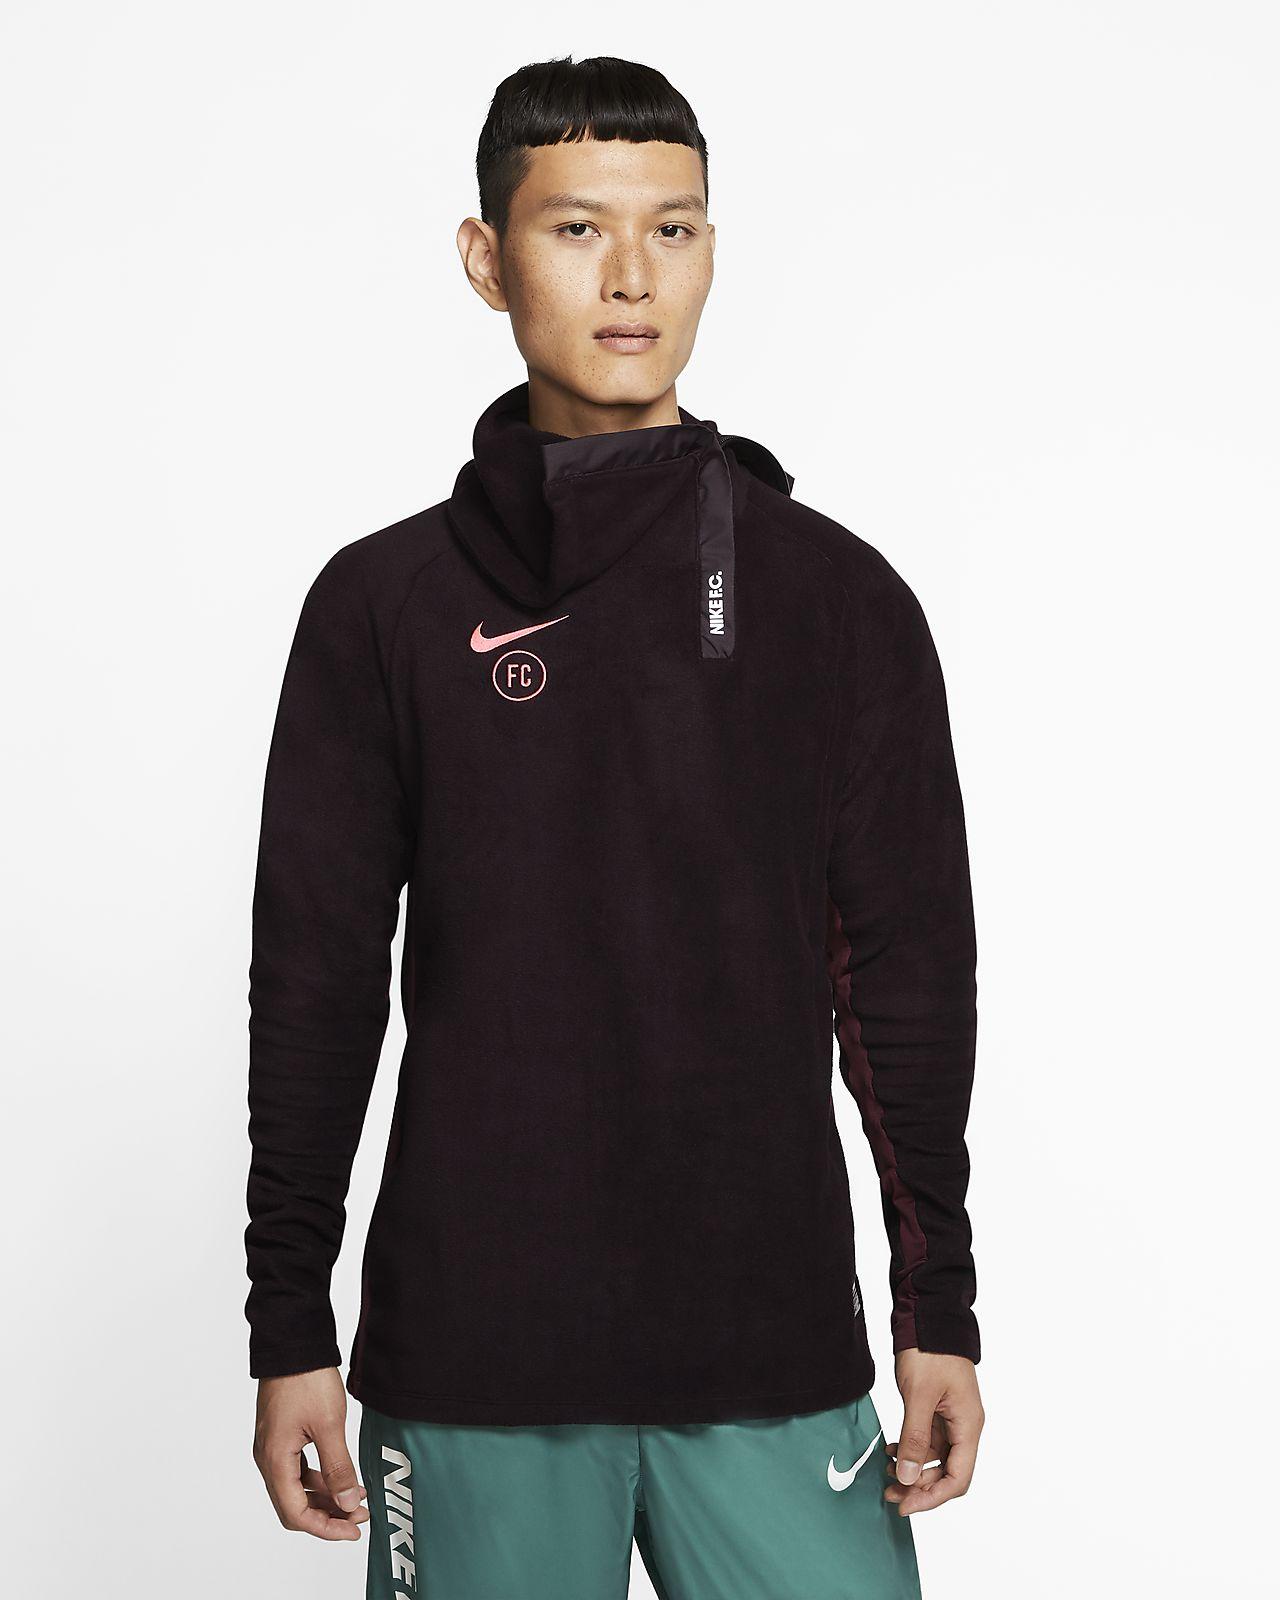 Nike F.C. Men's Soccer Drill Top